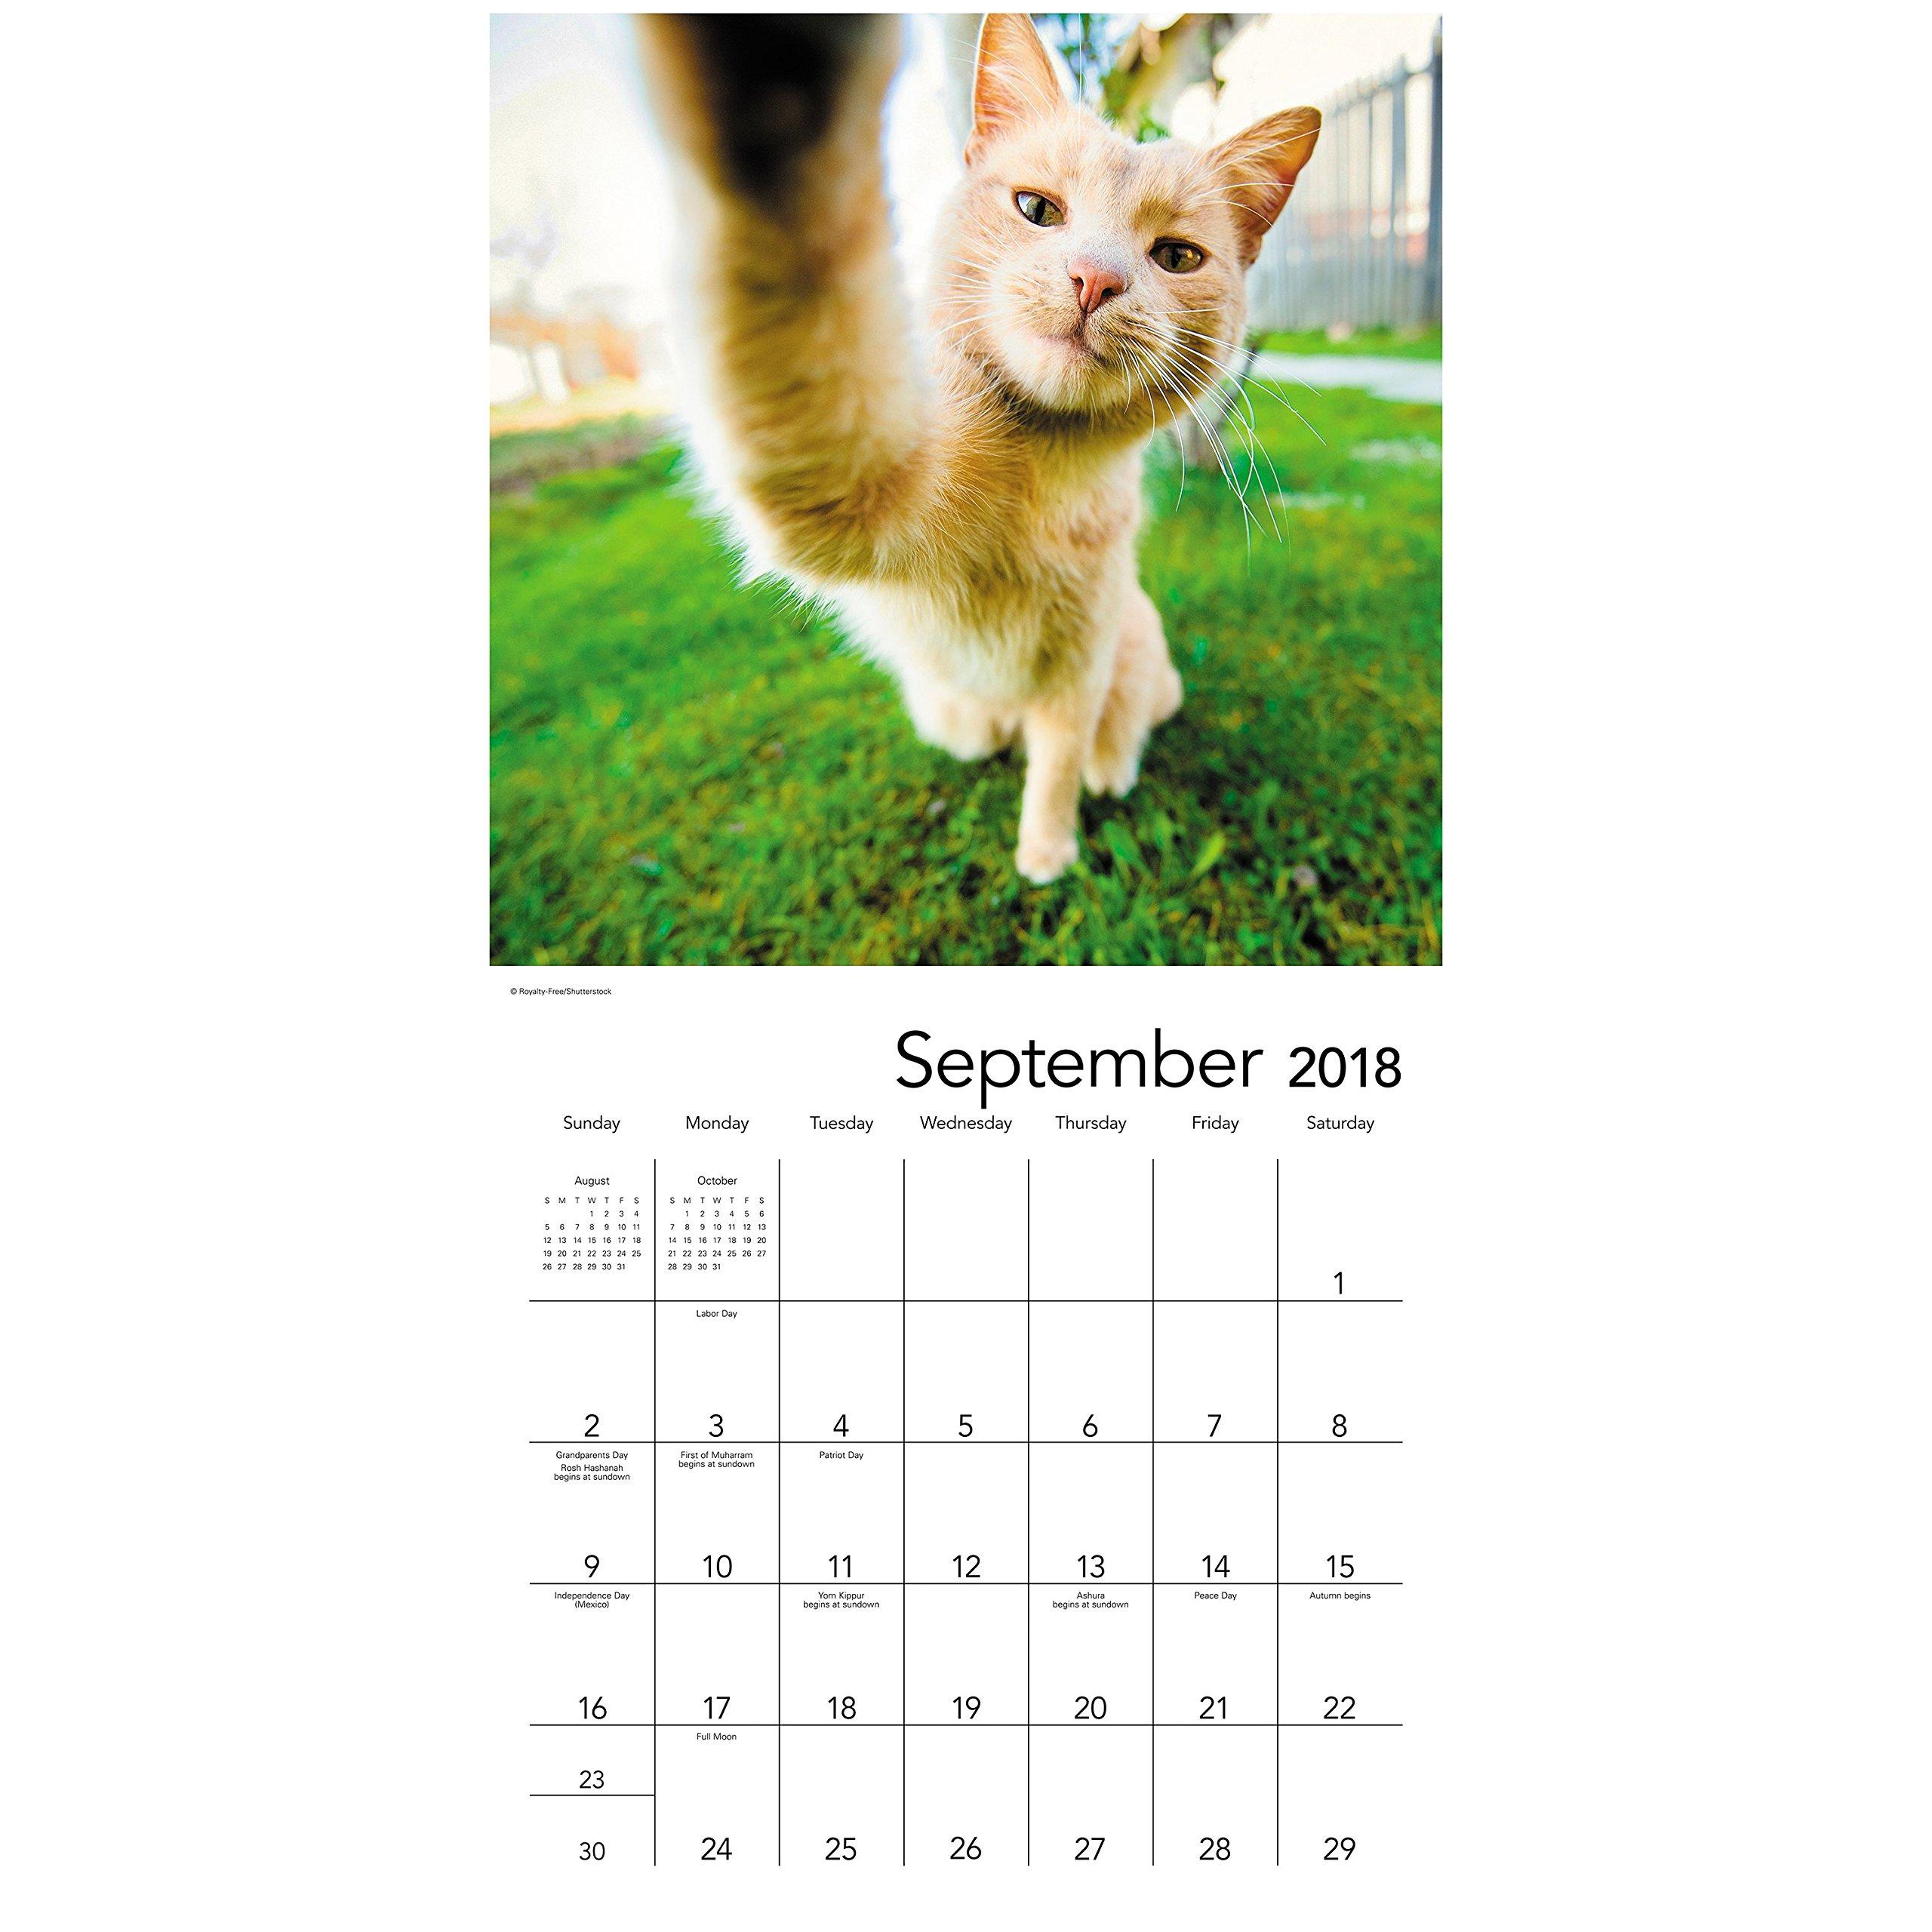 2018 Animal Selfies Wall Calendar (Mead): Mead: 0038576190788: Amazon.com:  Books